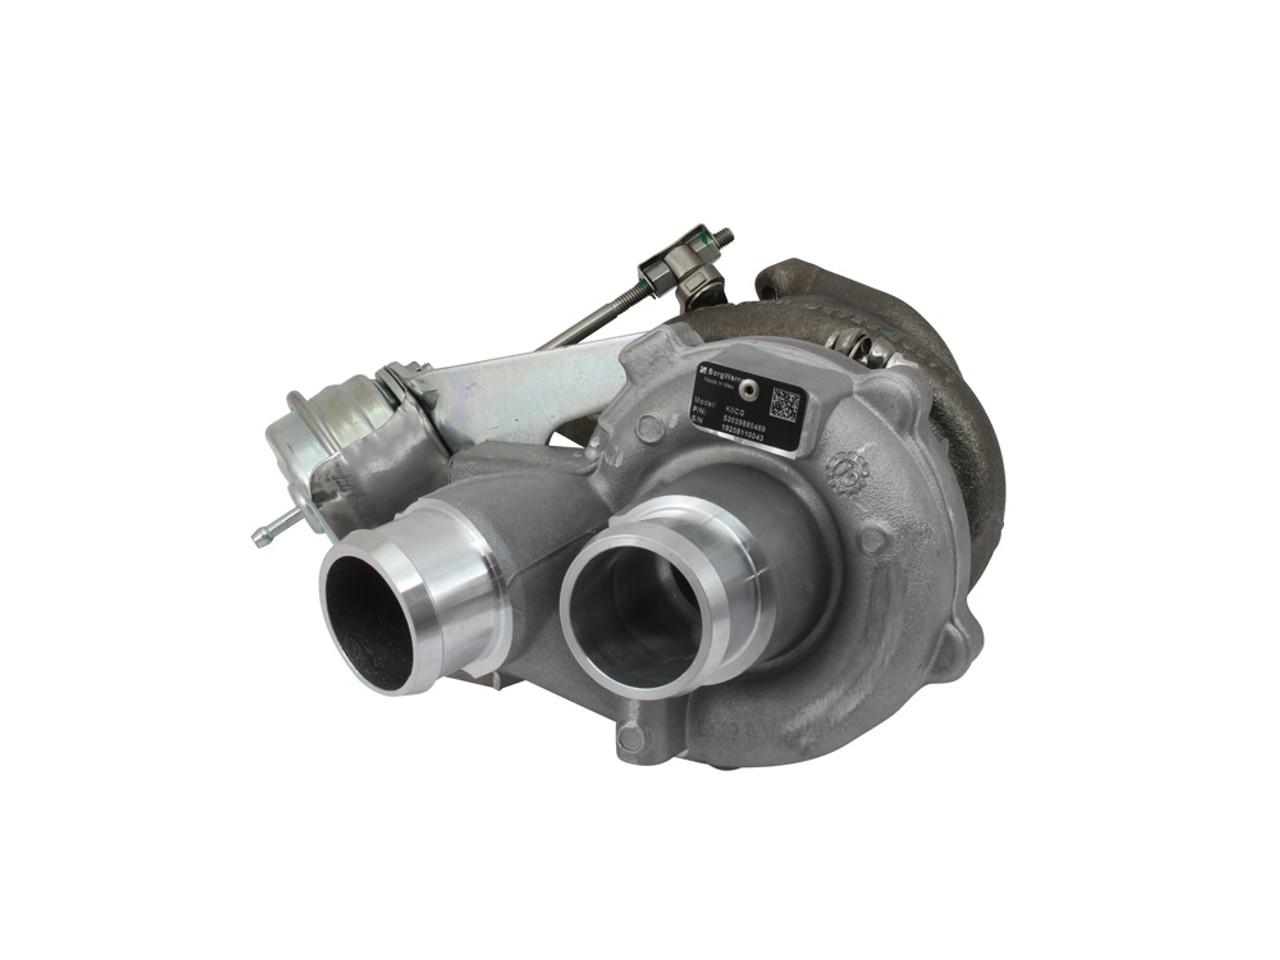 2013-2016 Borg Warner 3.5 Ecoboost F150 Factory Turbo 53039880469 53039900469 Left Side